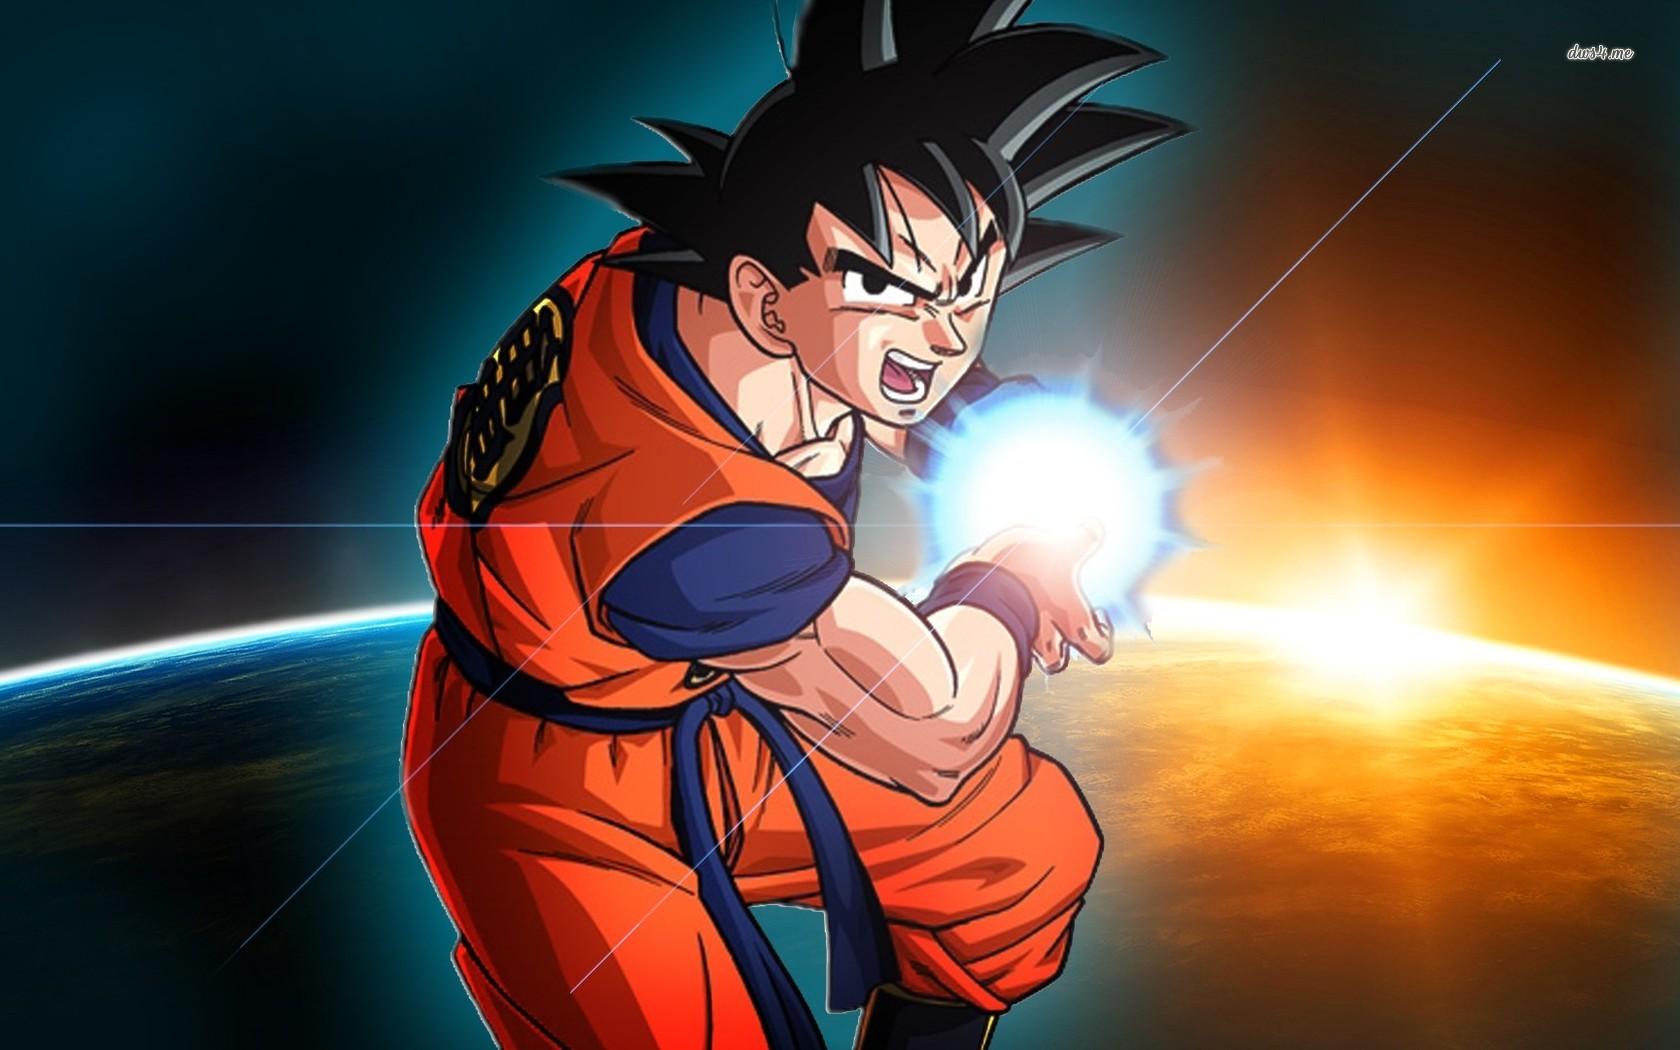 Goku   Dragon Ball Z wallpaper 1280x800 Goku   Dragon Ball Z wallpaper 1680x1050